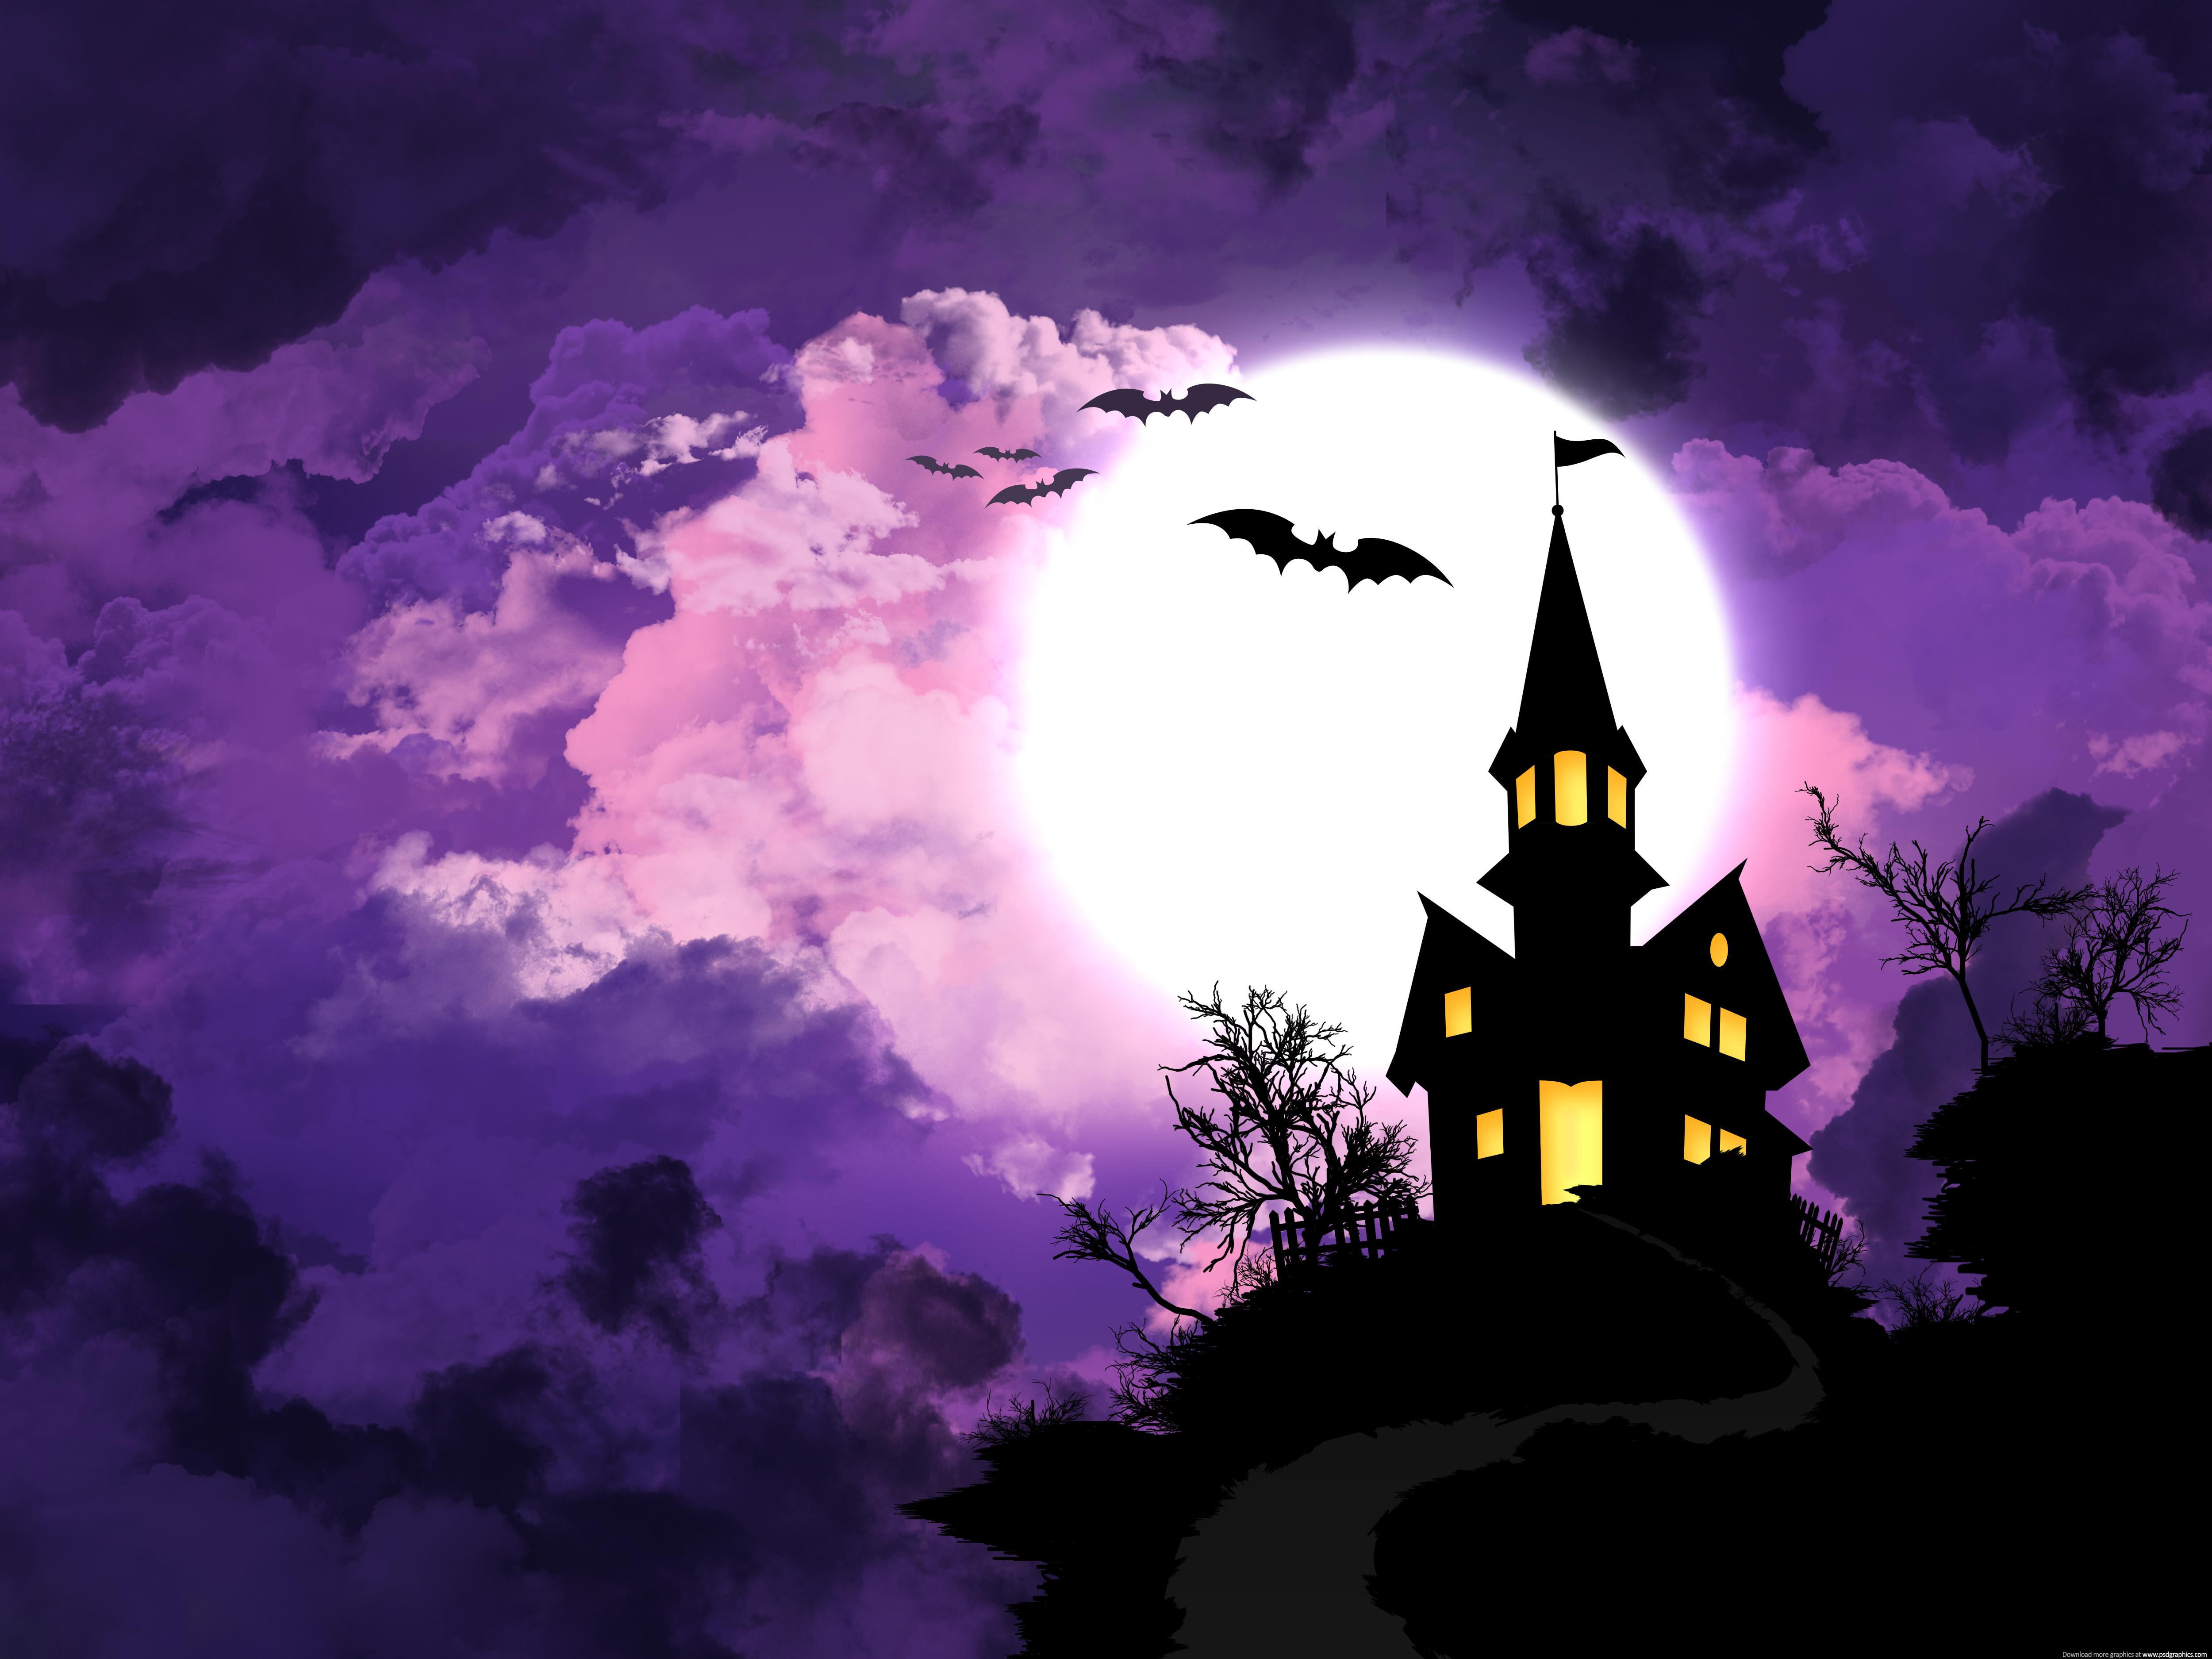 Free Download Halloween Background Wallpaper Images 10 Cool Hd Wallpaperizcom 5000x3750 For Your Desktop Mobile Tablet Explore 77 Cool Halloween Backgrounds Google Free Halloween Wallpaper